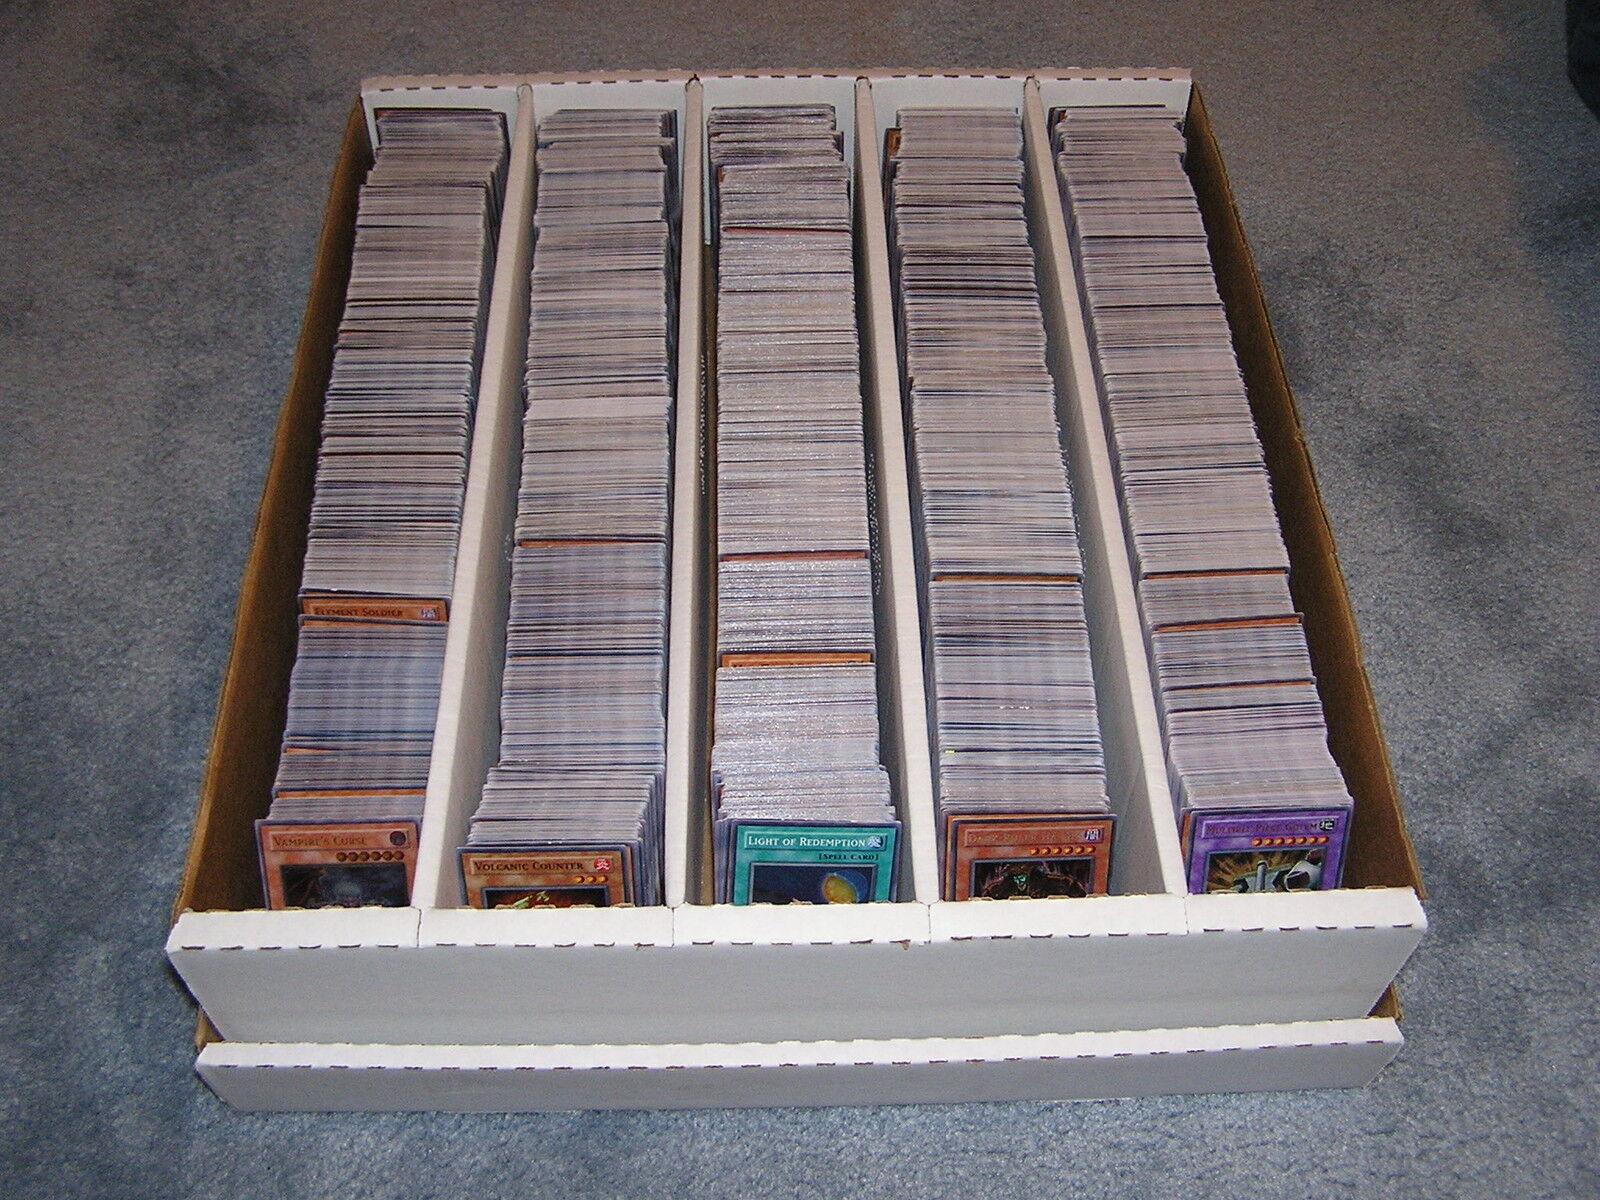 YUGIOH 100 Card Lot!! 1000s Available, Super, Secret, Ultra  4 Rares & 6 Holos!